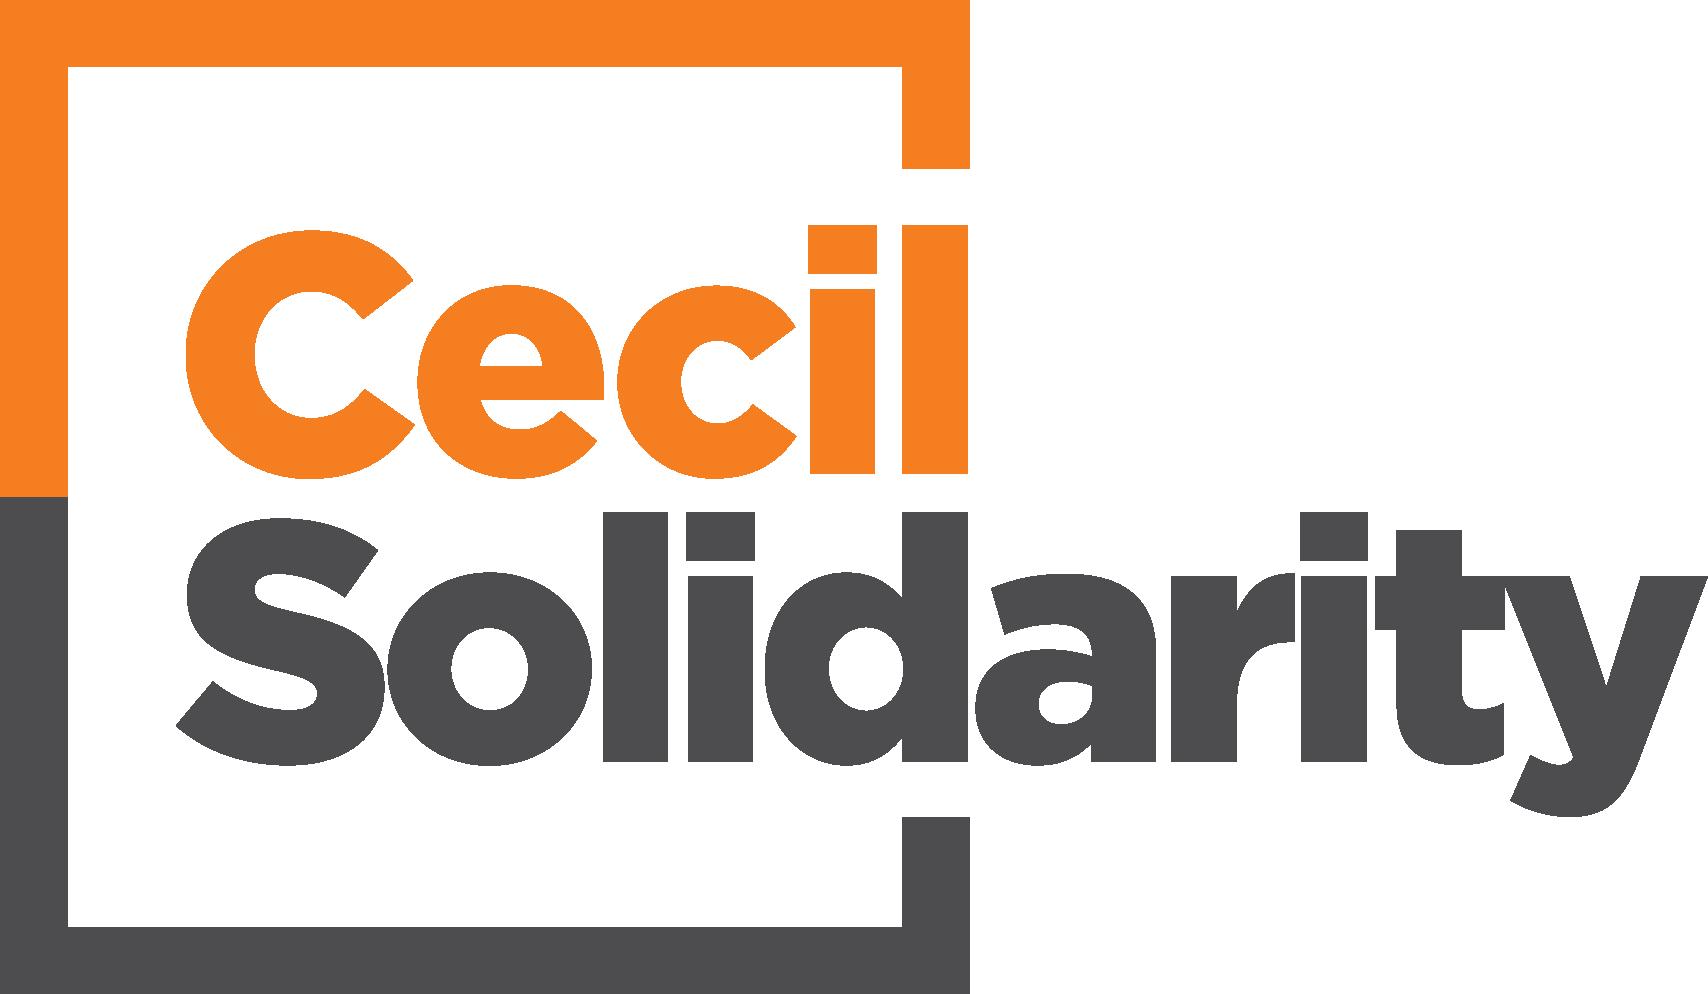 Cecil Solidarity